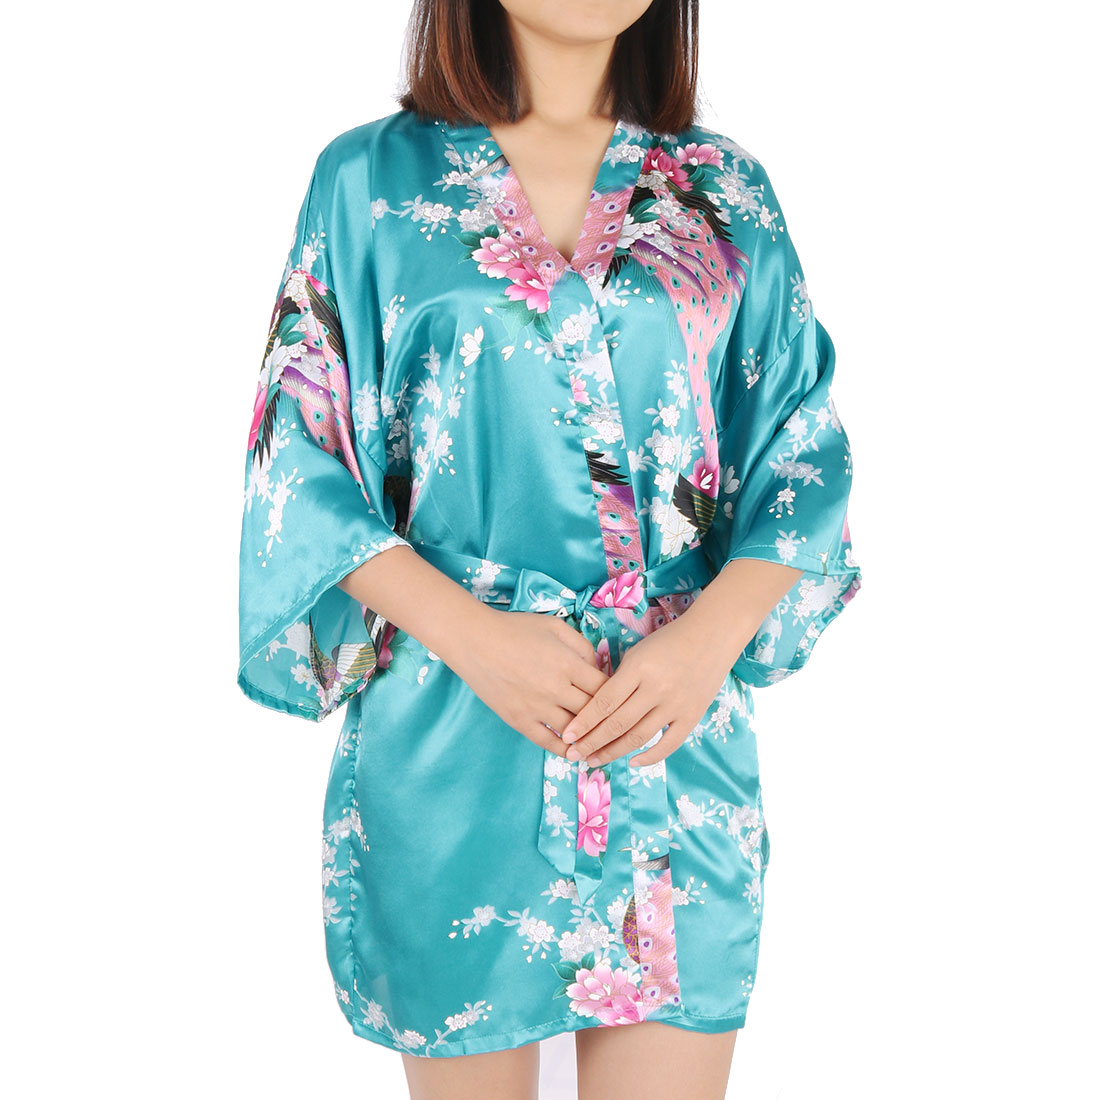 Vintage Floral Satin Robe Dressing Gown Rayon Wedding Lake Blue Floral Xxl Walmart Canada